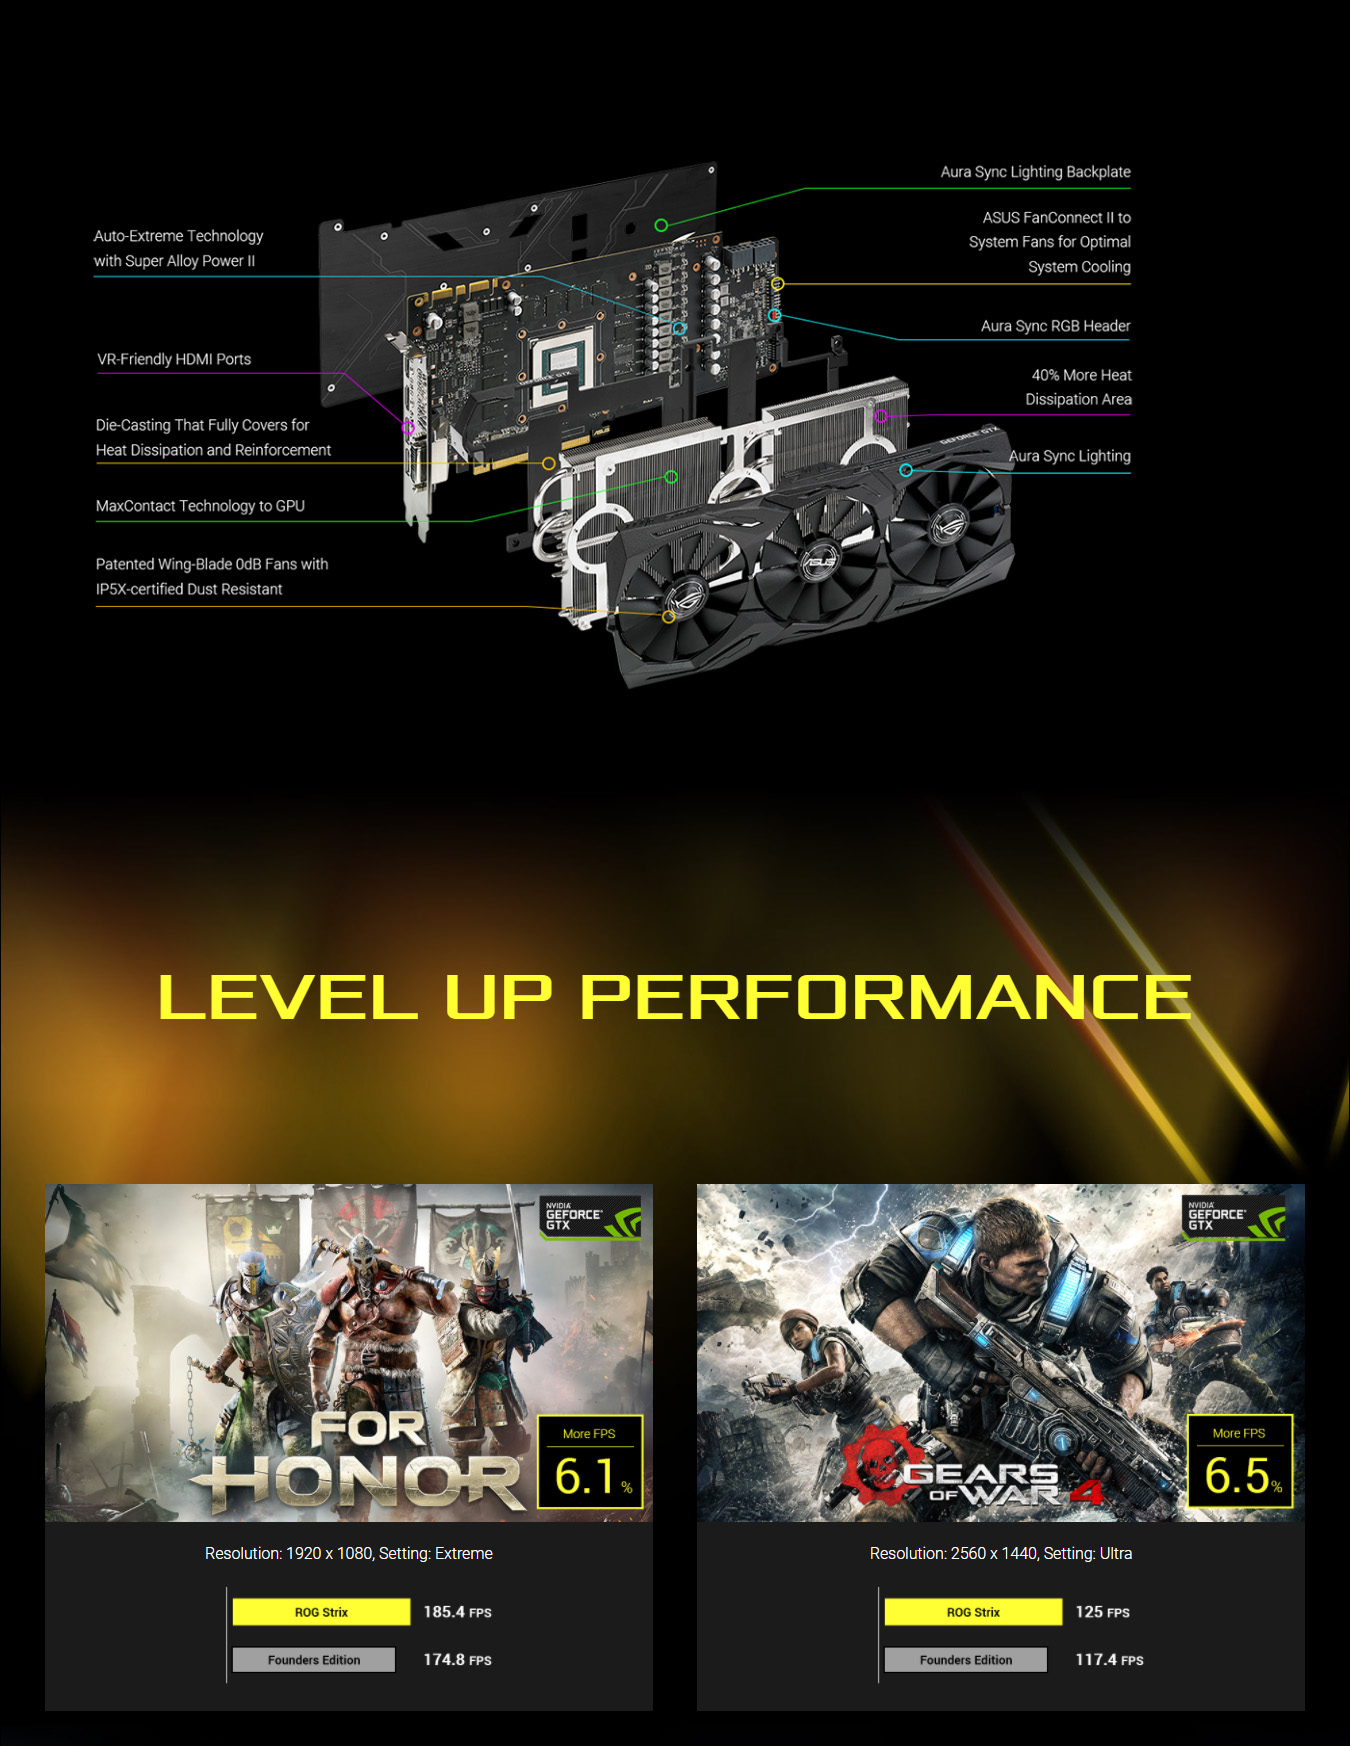 Asus ROG Strix GTX 1080ti Features